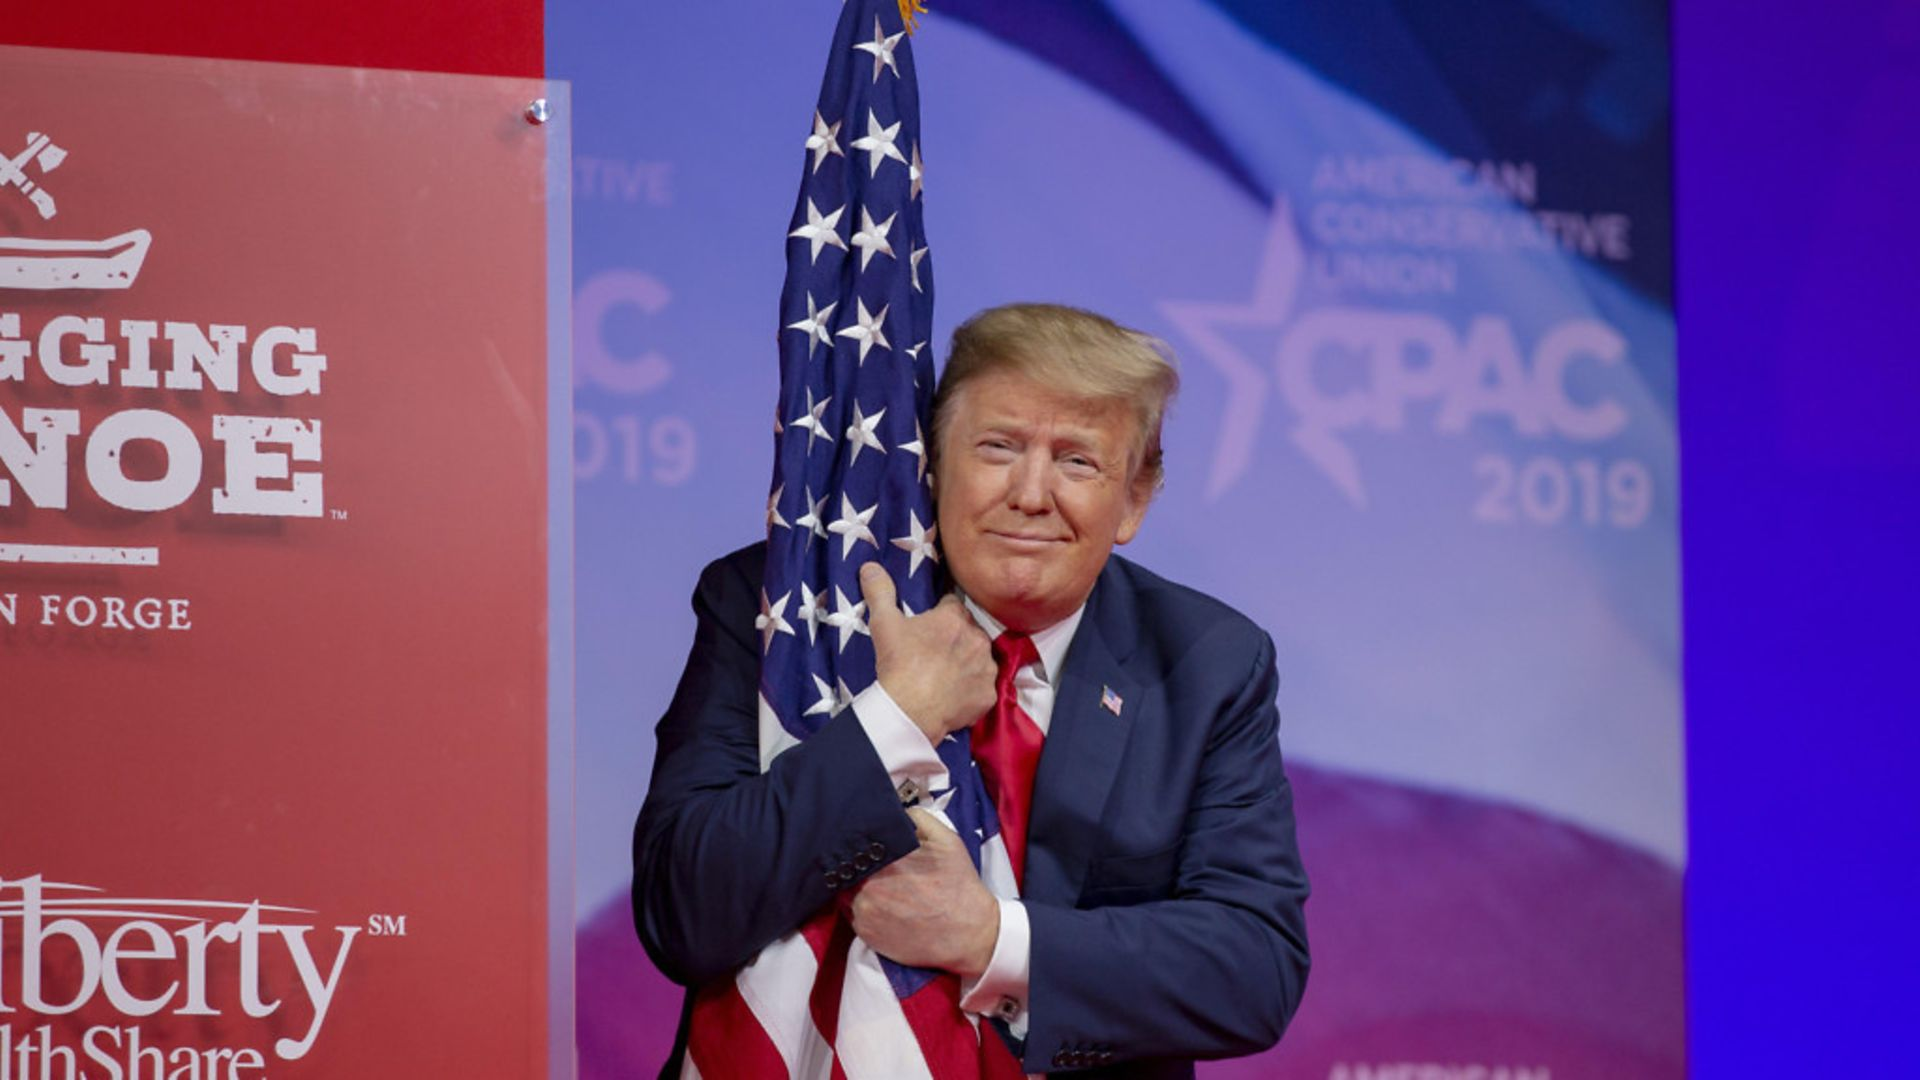 U.S. President Donald Trump hugs the U.S. flag - Credit: Getty Images